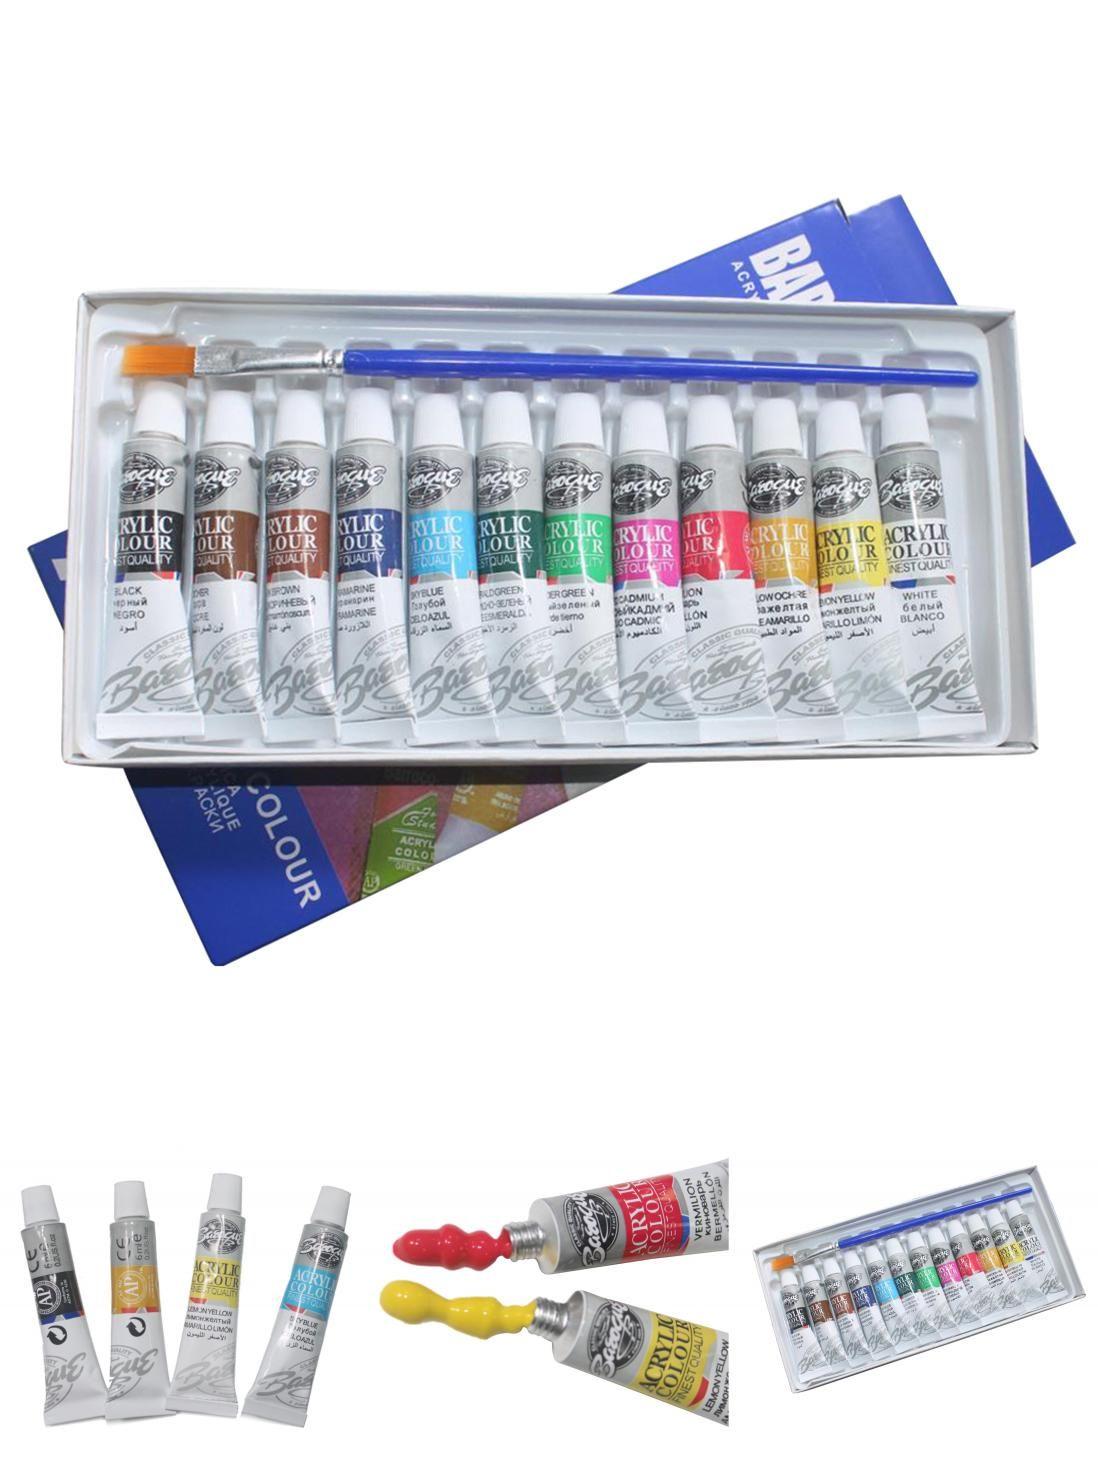 Nail Miniatures Models Nylon Hair Oil Airplane Kits MEEDEN Detail Paint Brush Set 6 Miniature Art Brushes for Fine Detailing /& Art Painting Acrylic Watercolor